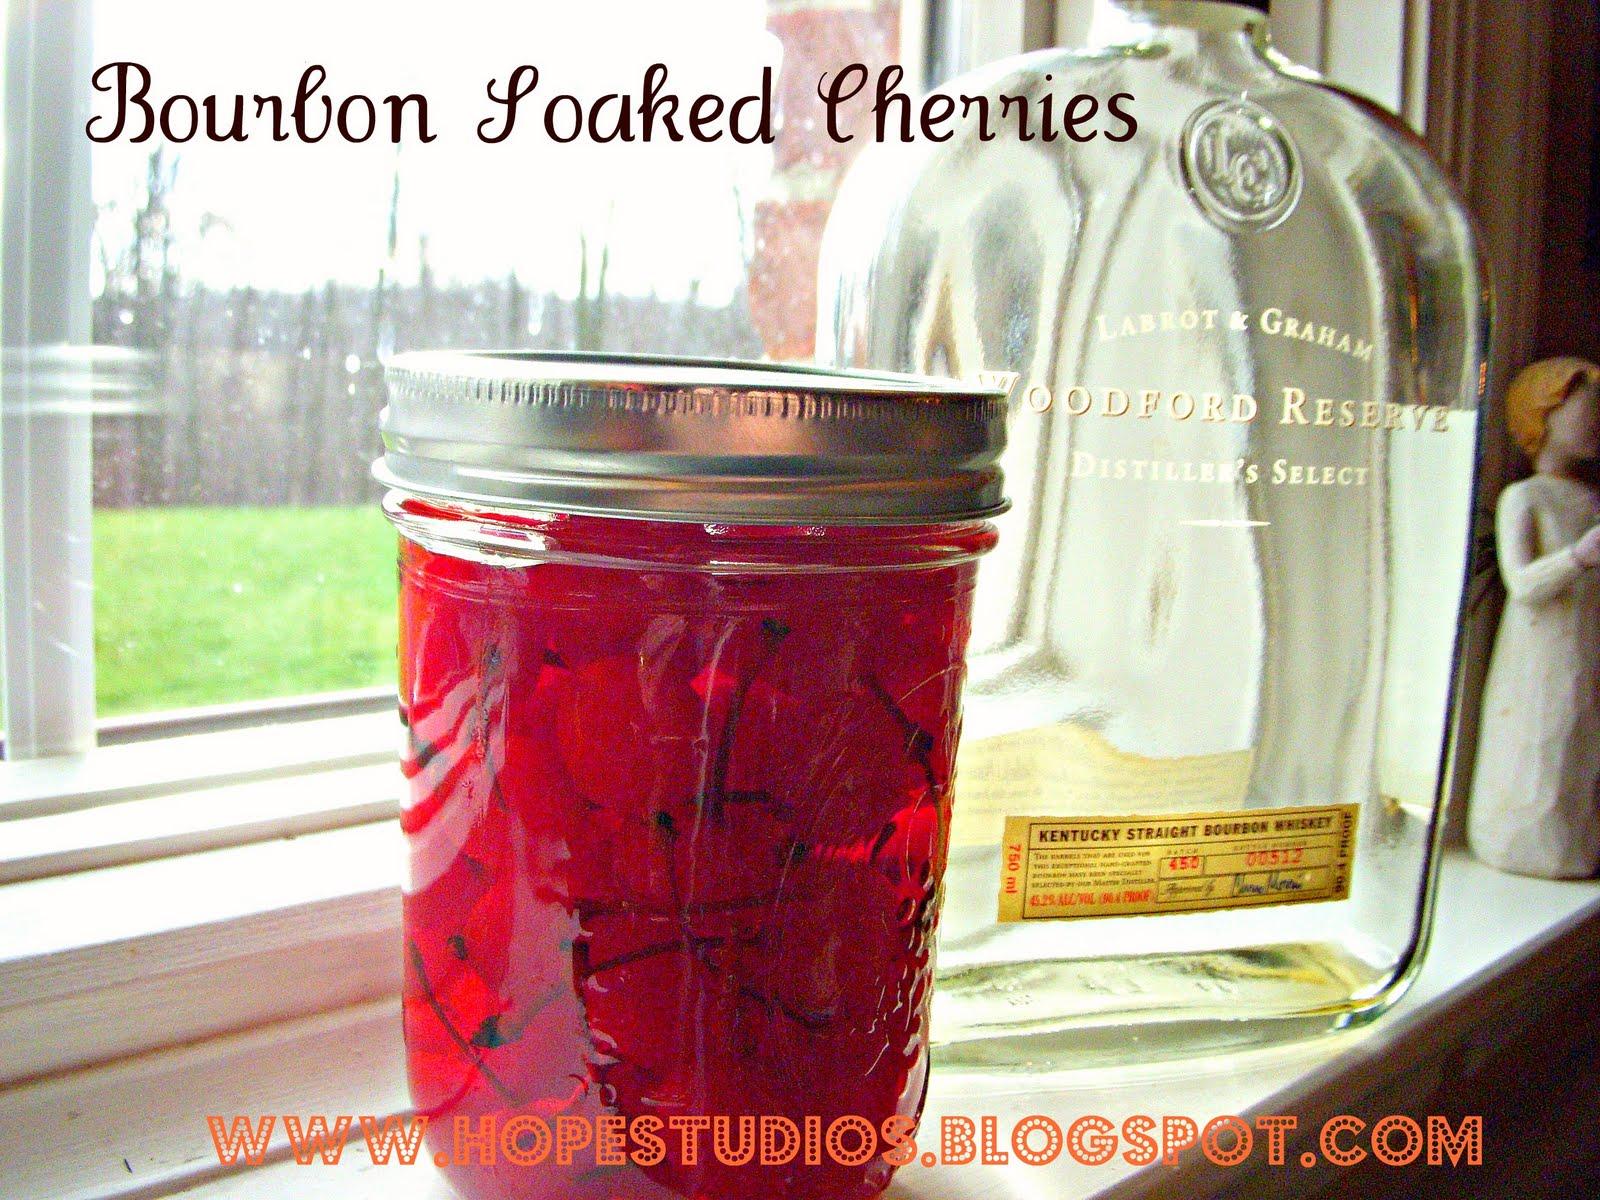 Hope Studios: Bourbon Soaked Cherries